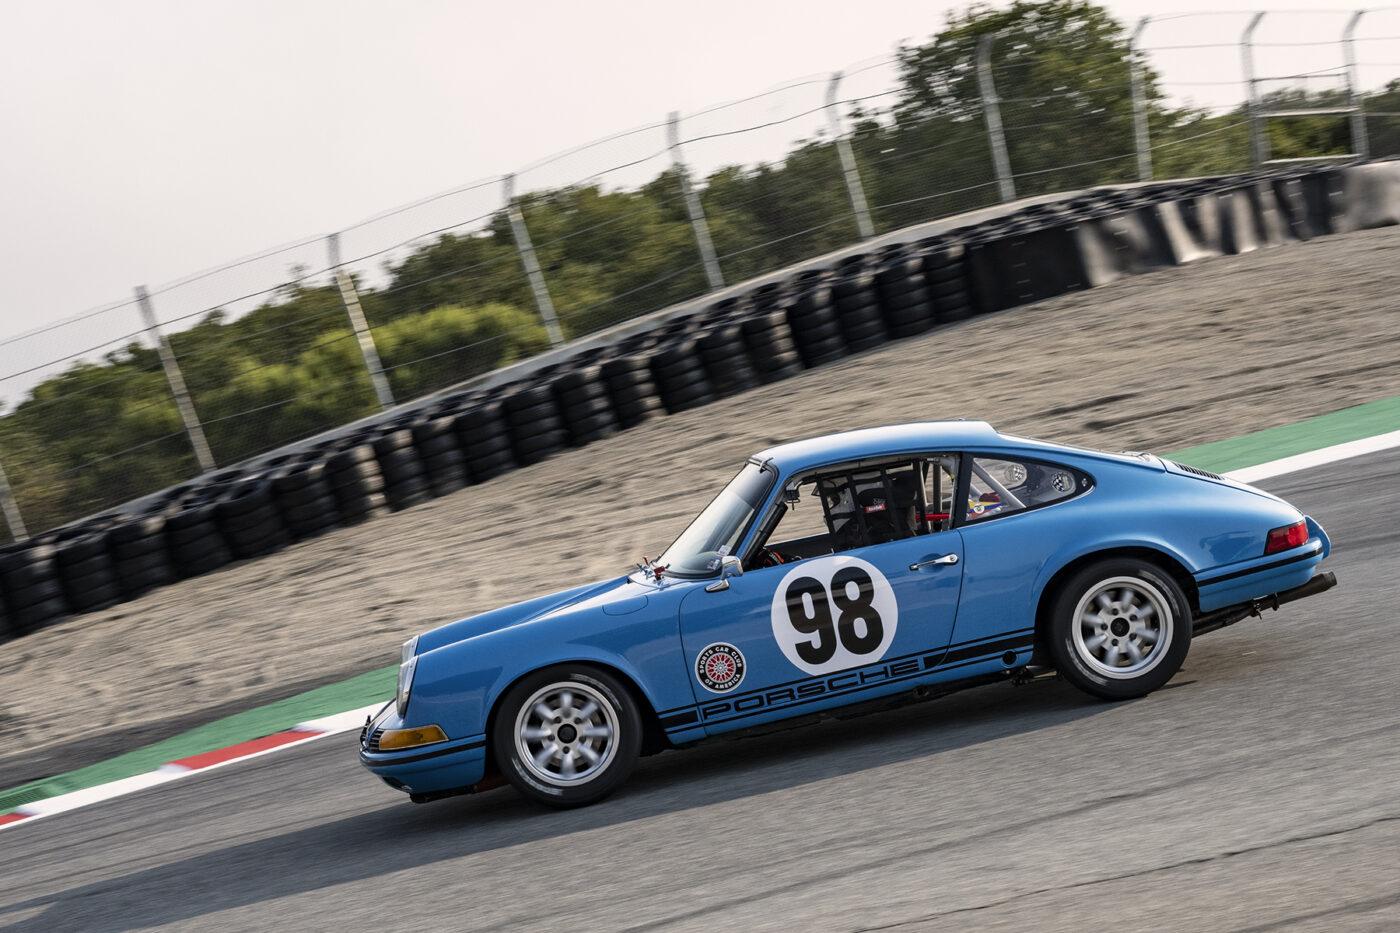 Mauricio Moro drops his 1970 Porsche 911S 2500 into the Corkscrew Saturday. ©2021 Dennis Gray